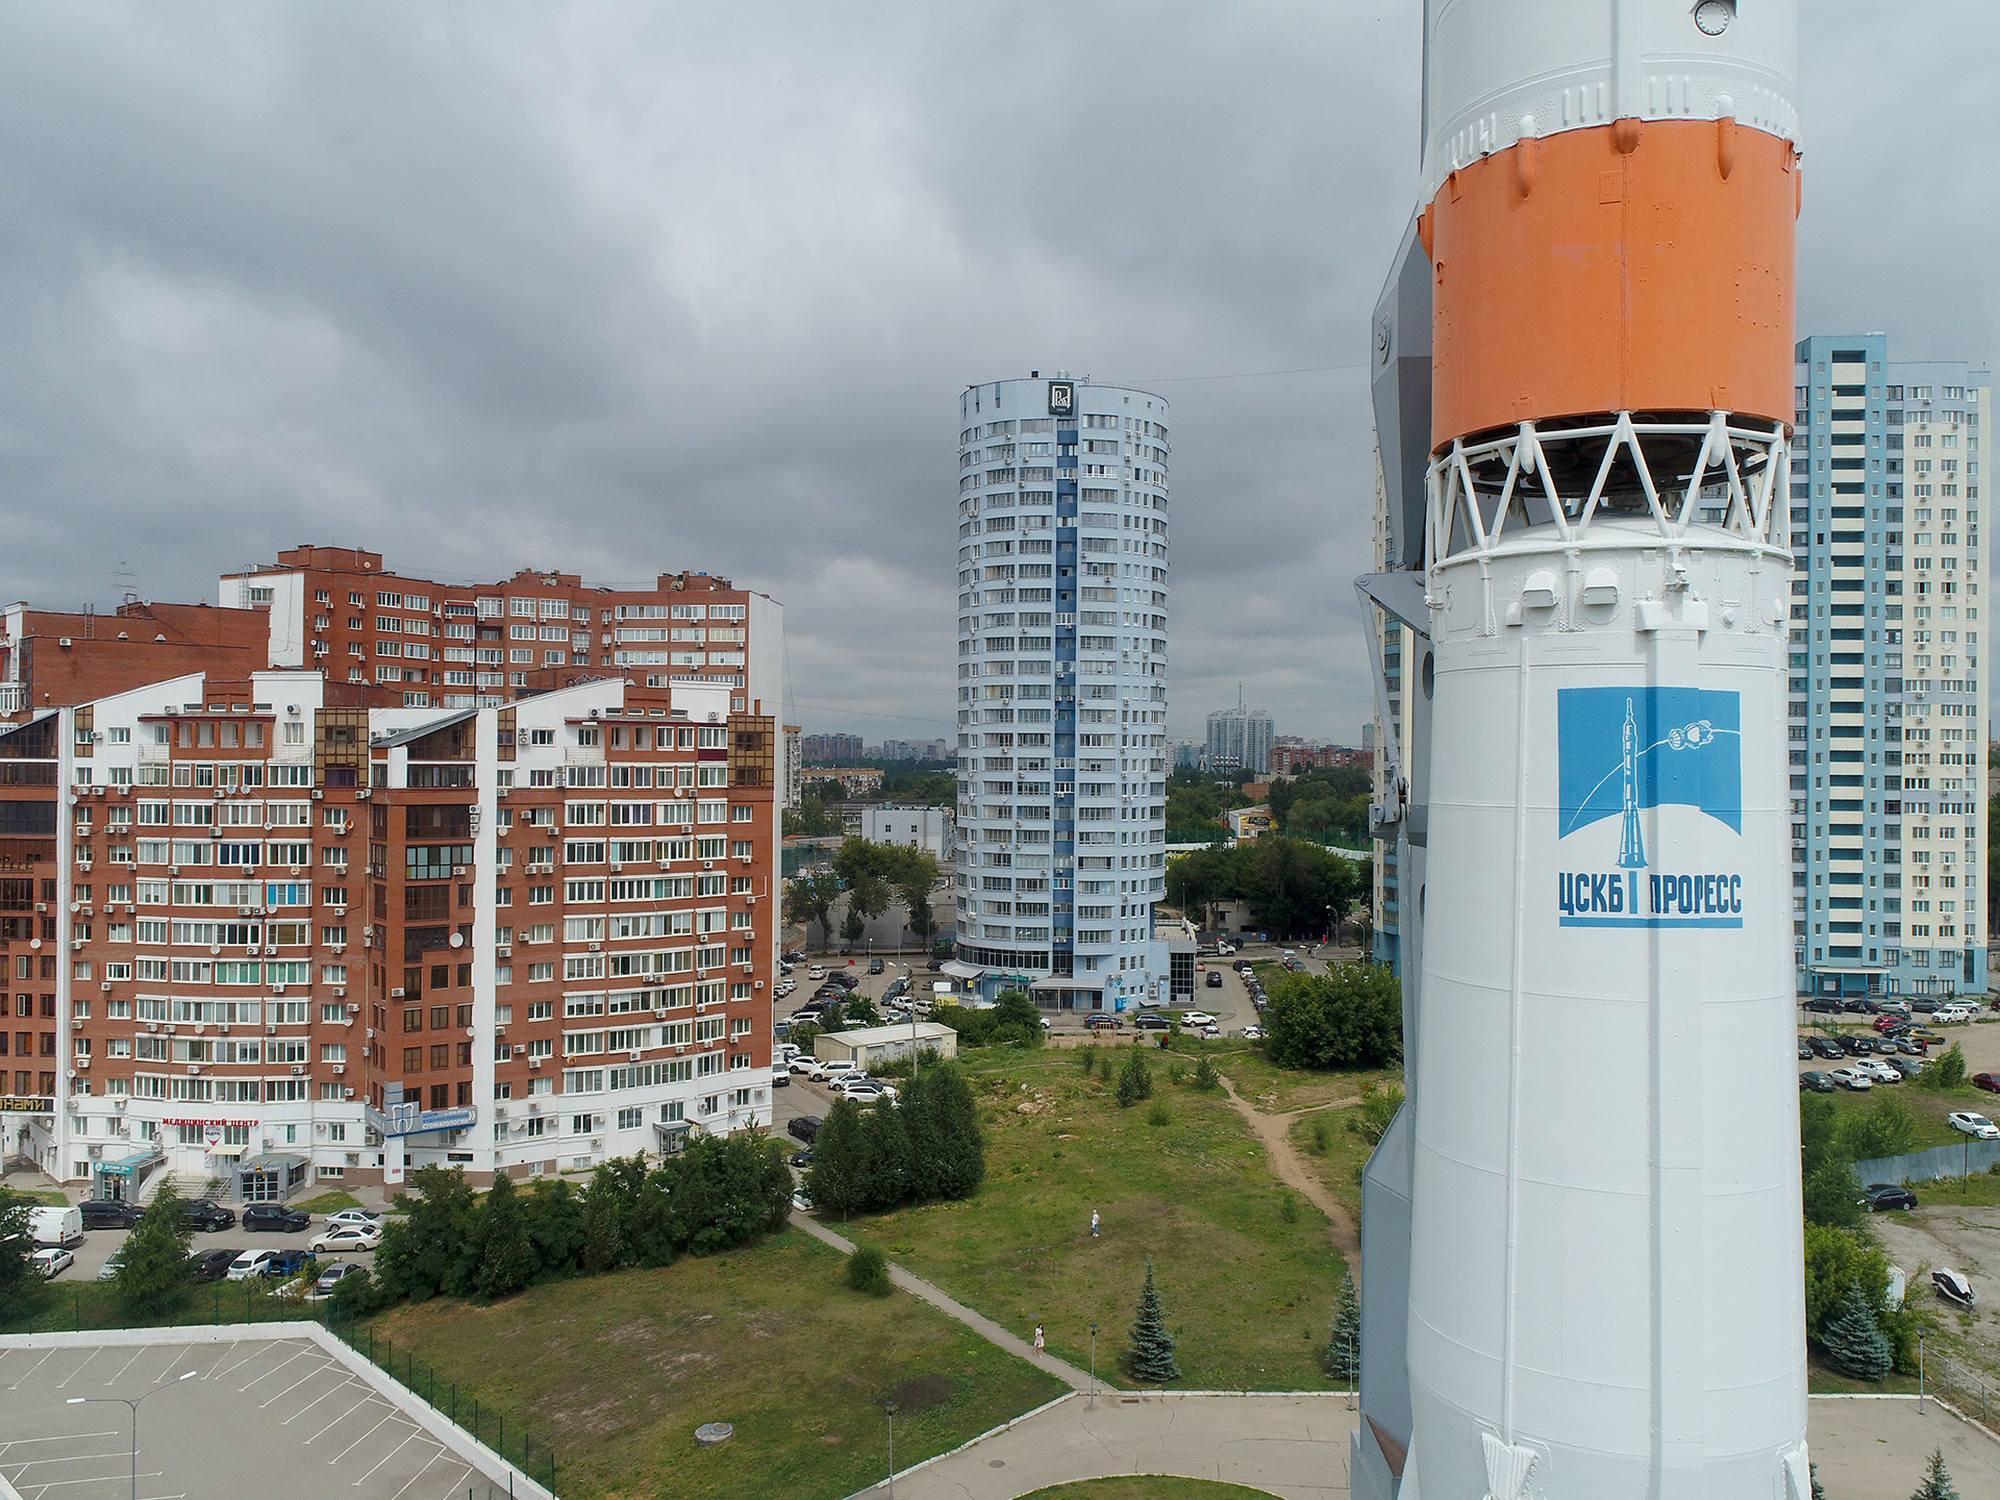 La fusée soyouz au milieu des habitations de Samara.